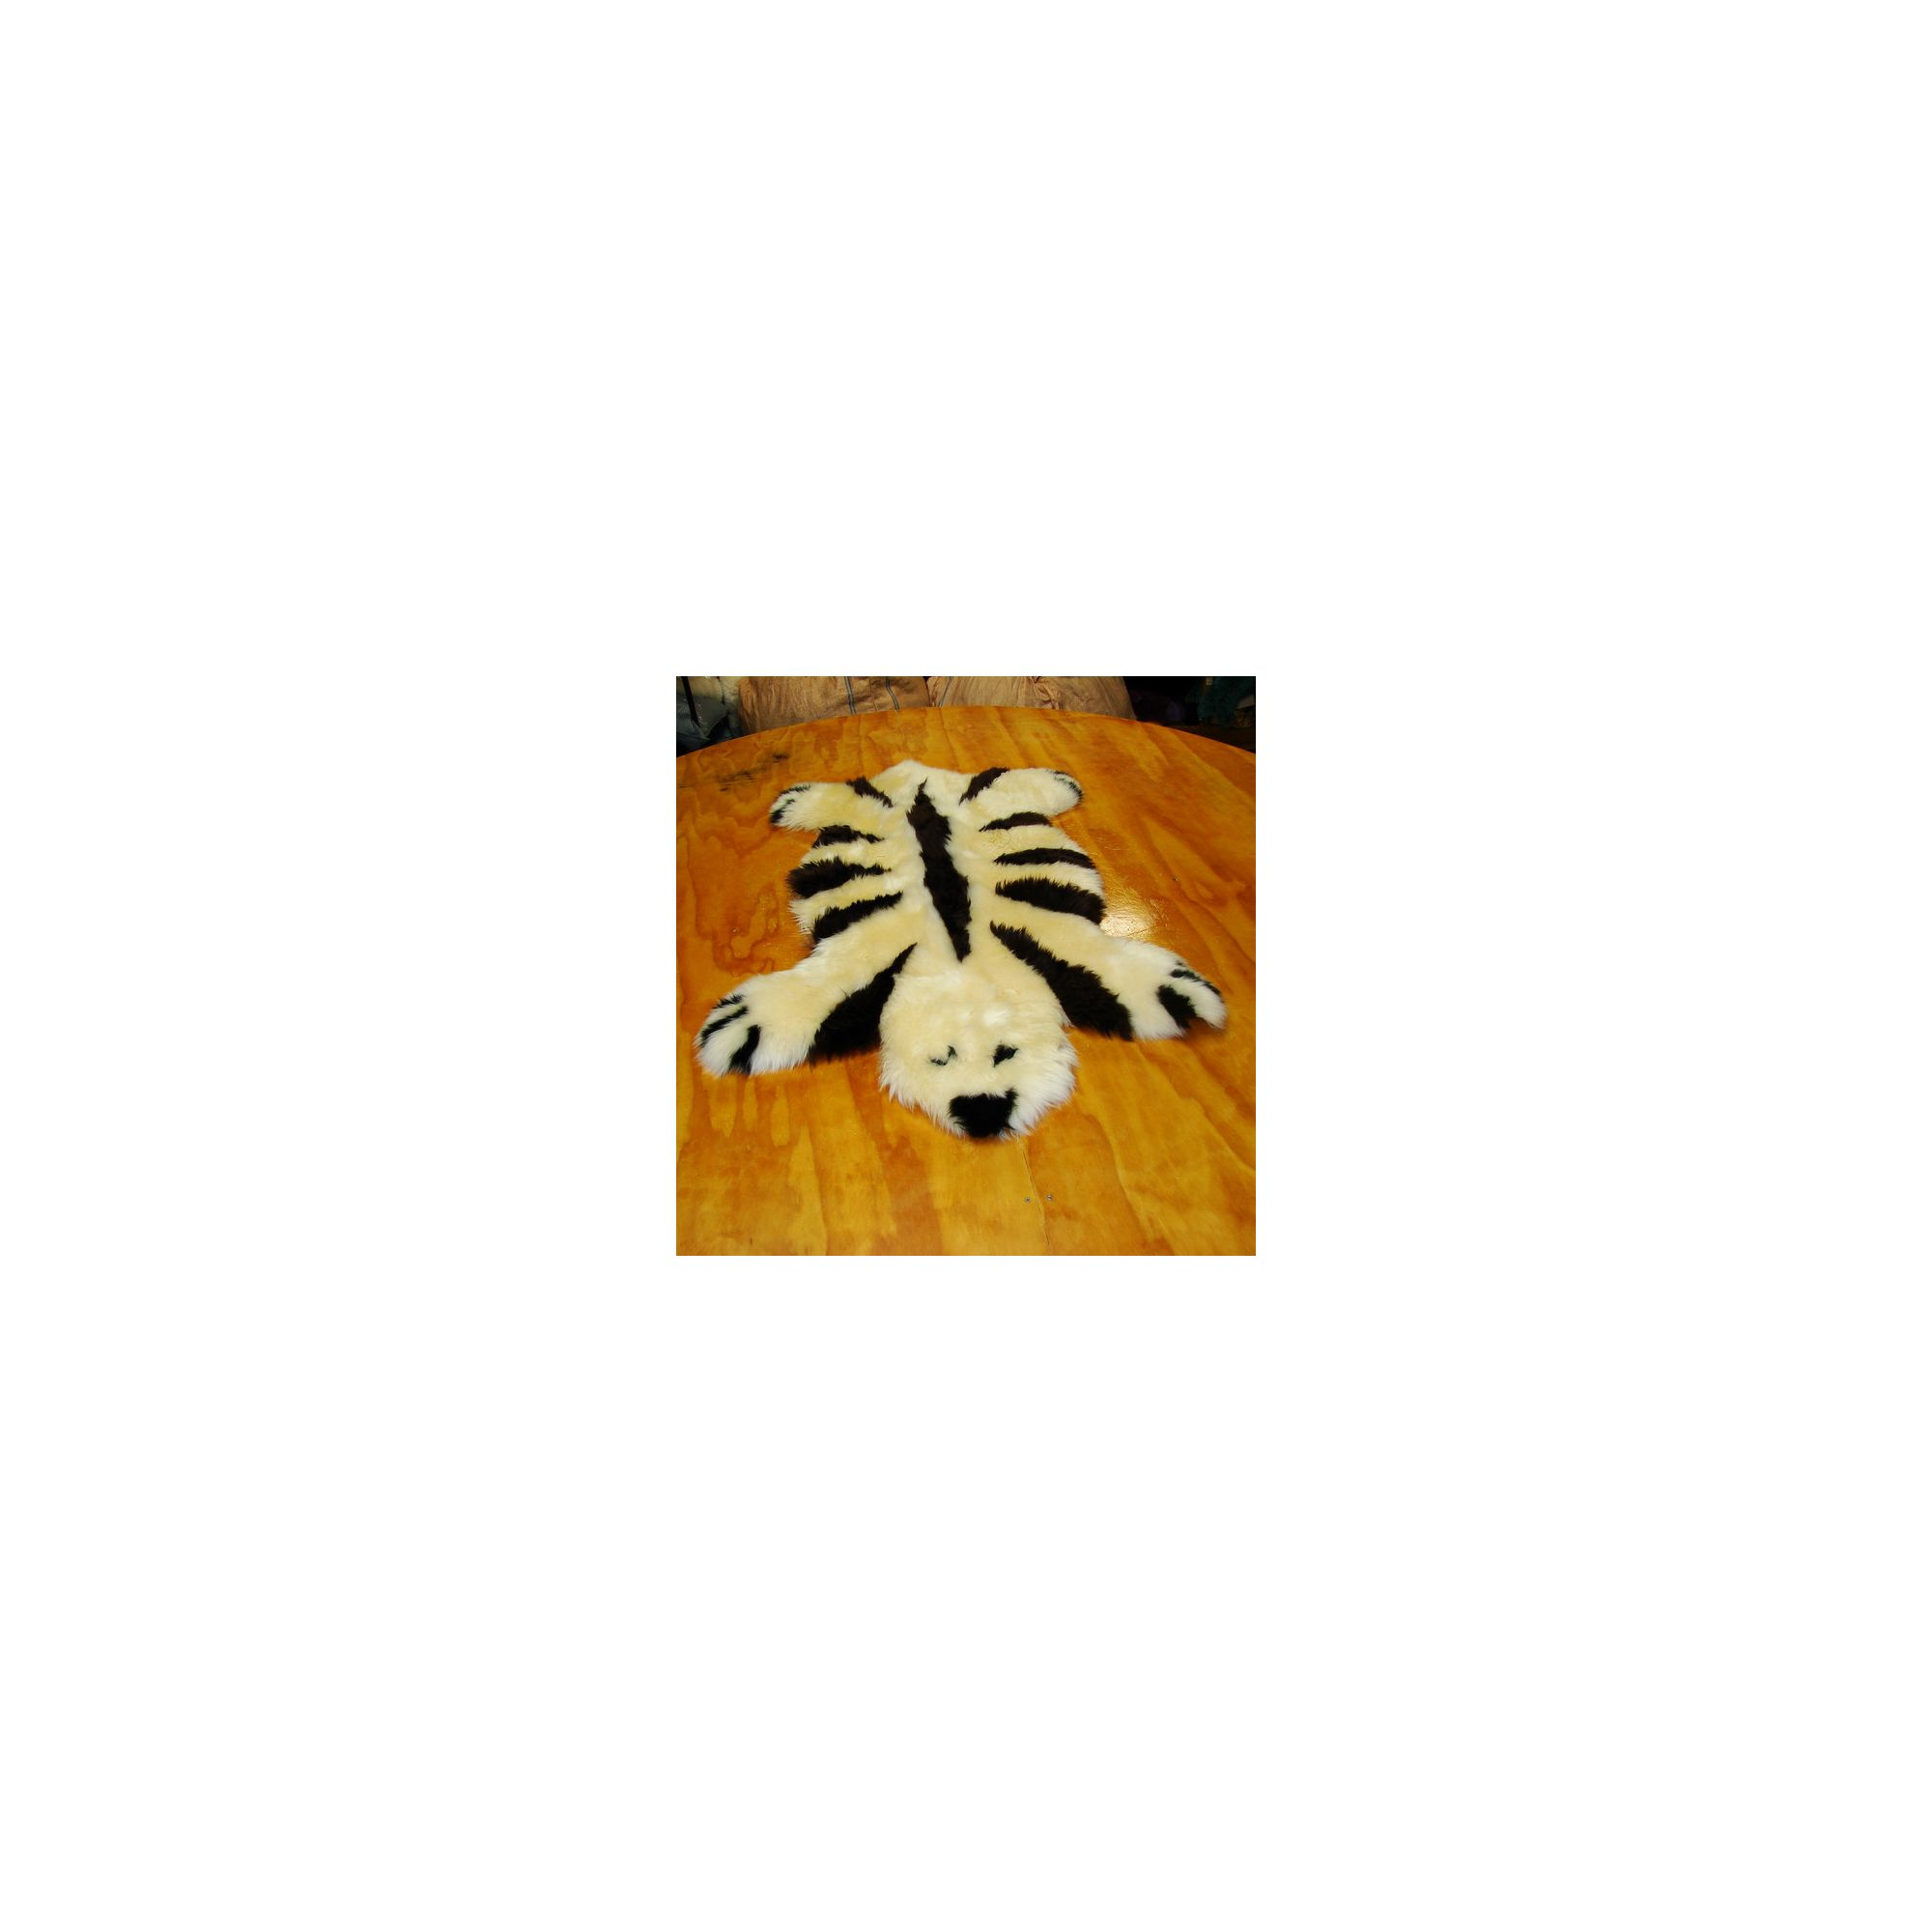 Bowron Sheepskin Designer Bear Rug in Champagne / Brown Striped - 115cm H x 80cm W